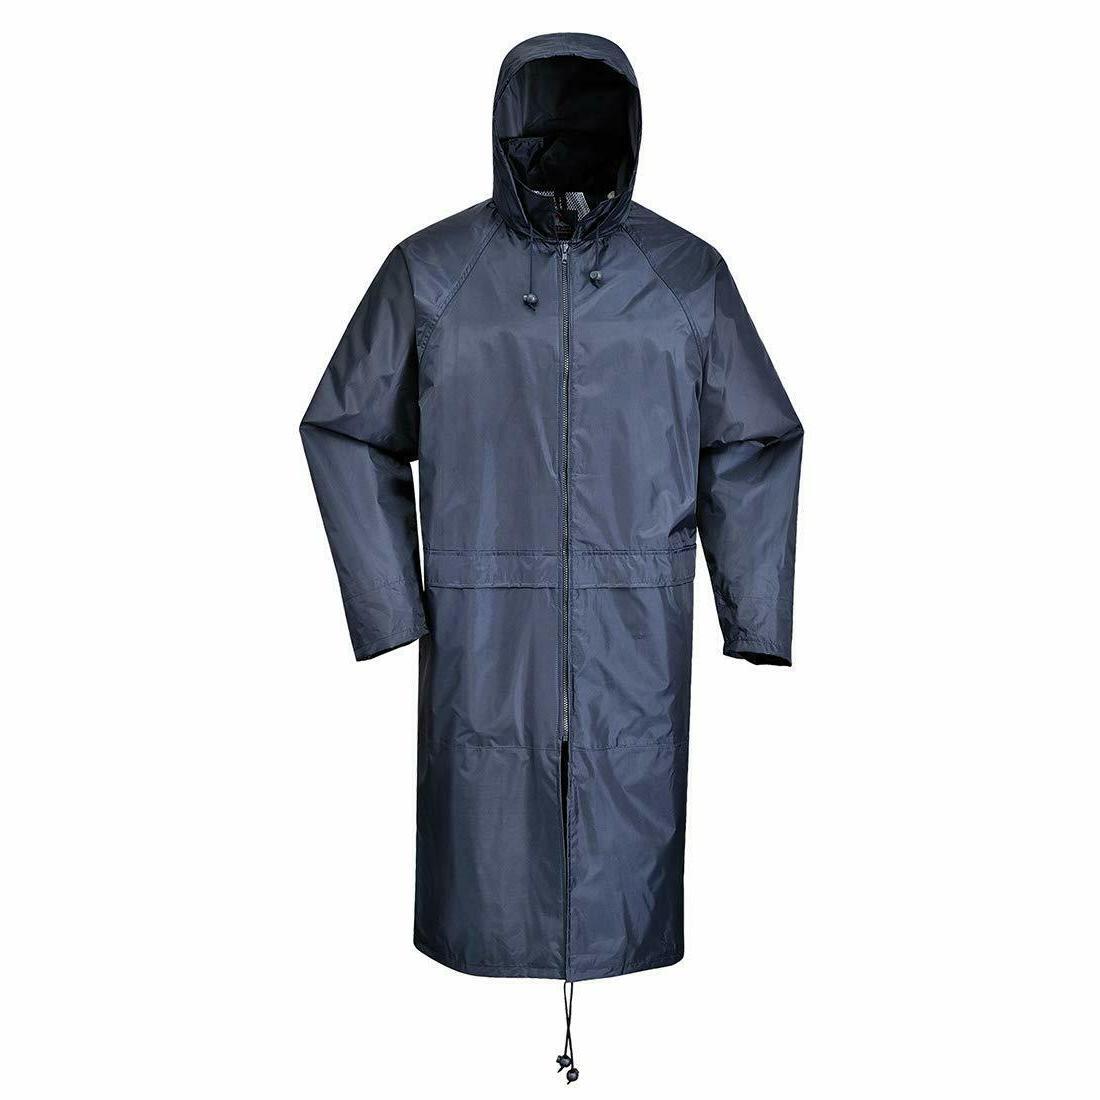 s438narxxl classic rain coat fabric xx large